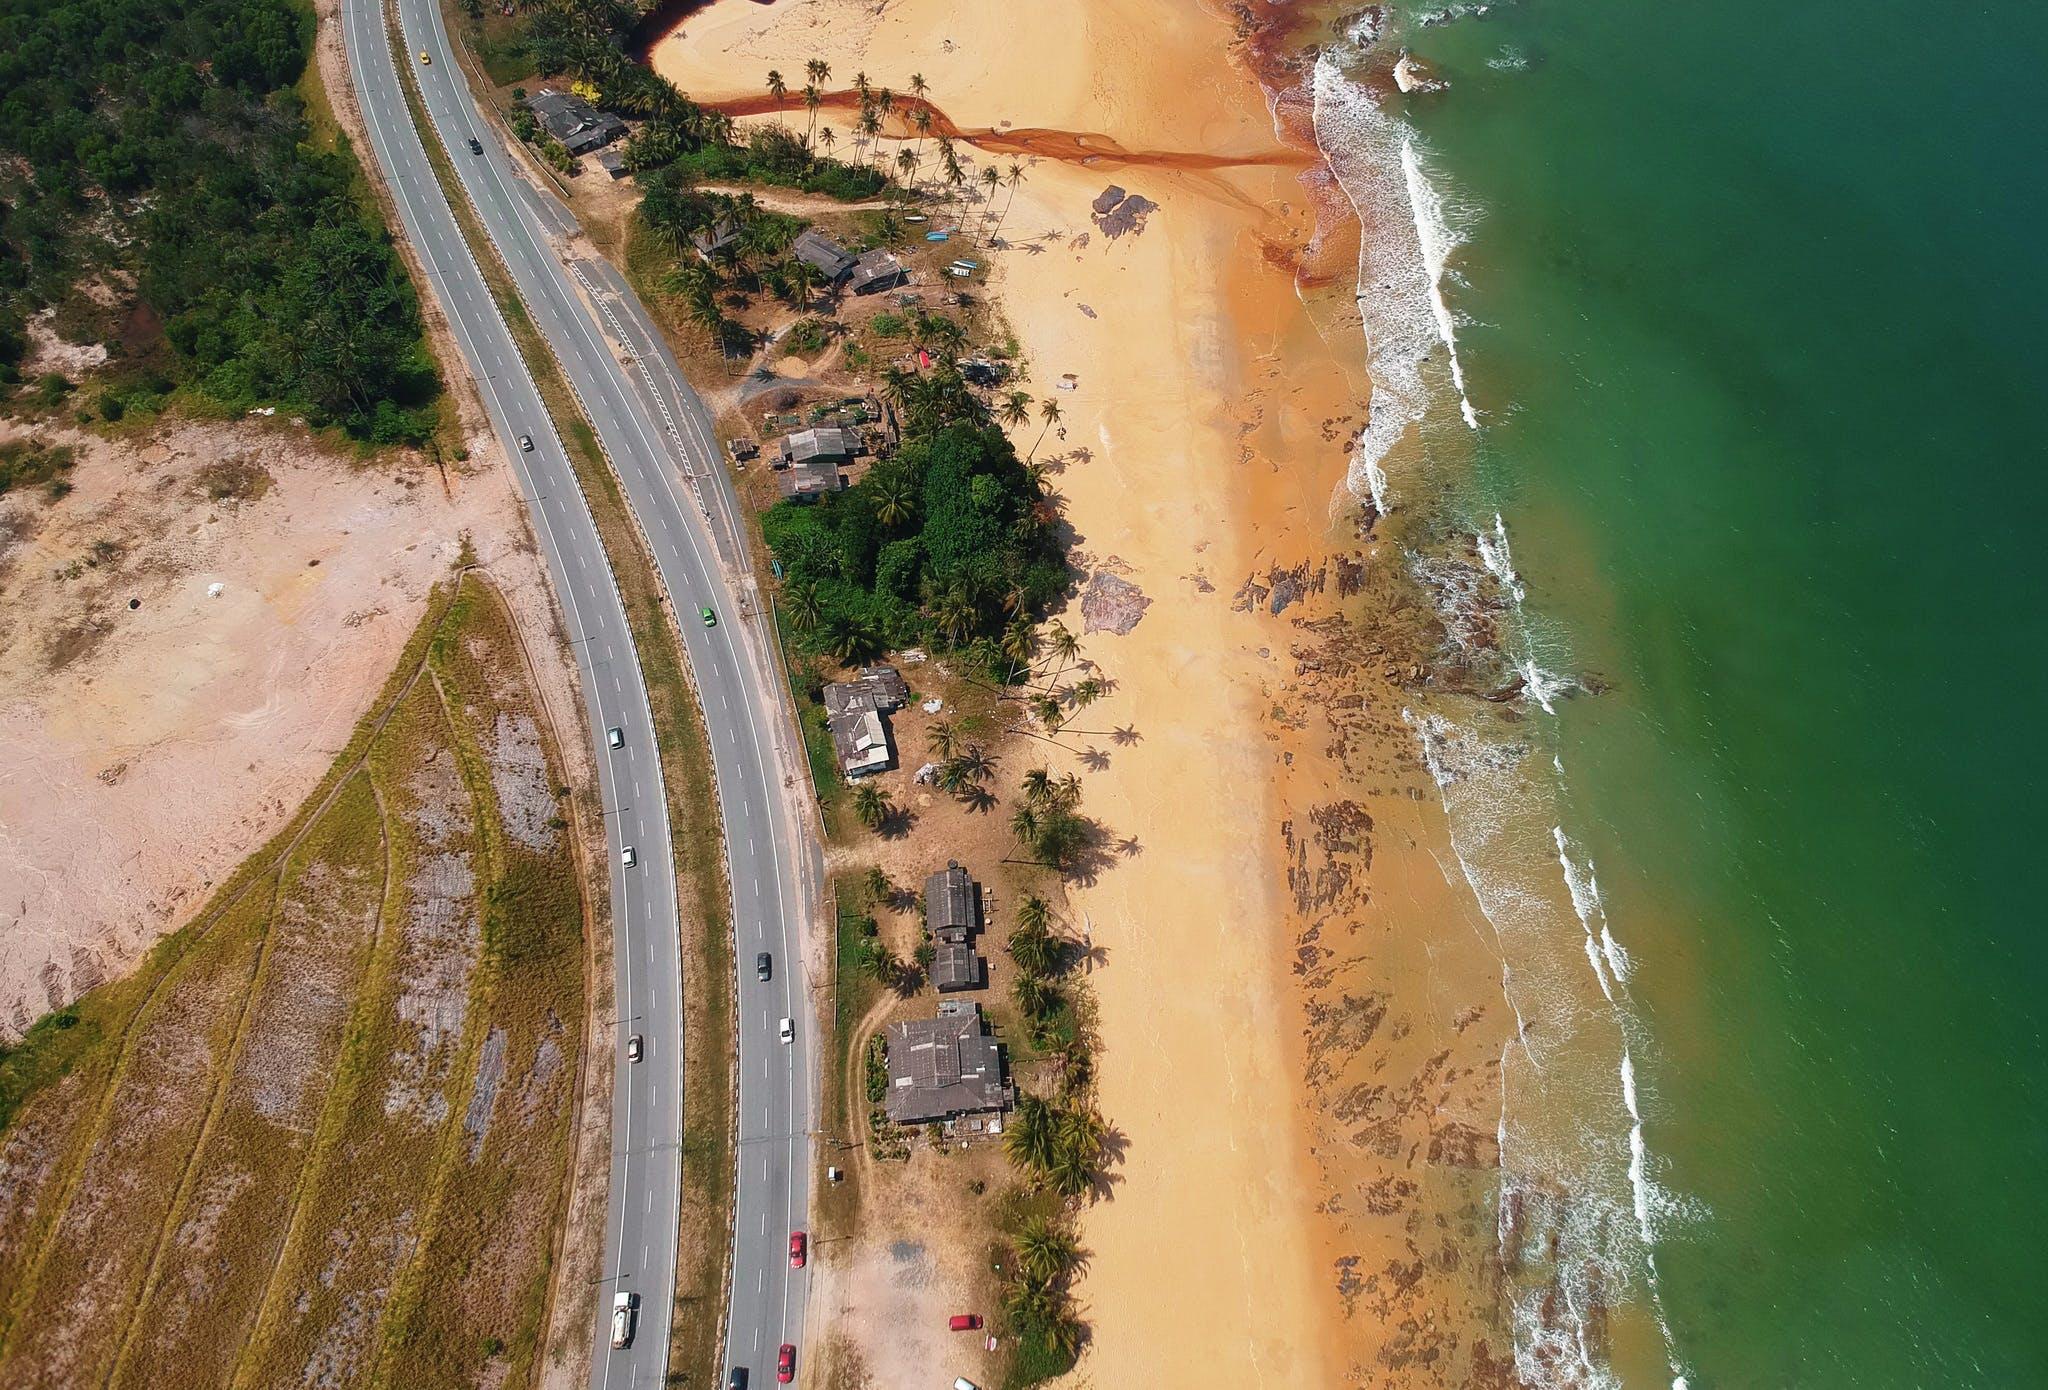 Aerial View of Road Beside the Seashore